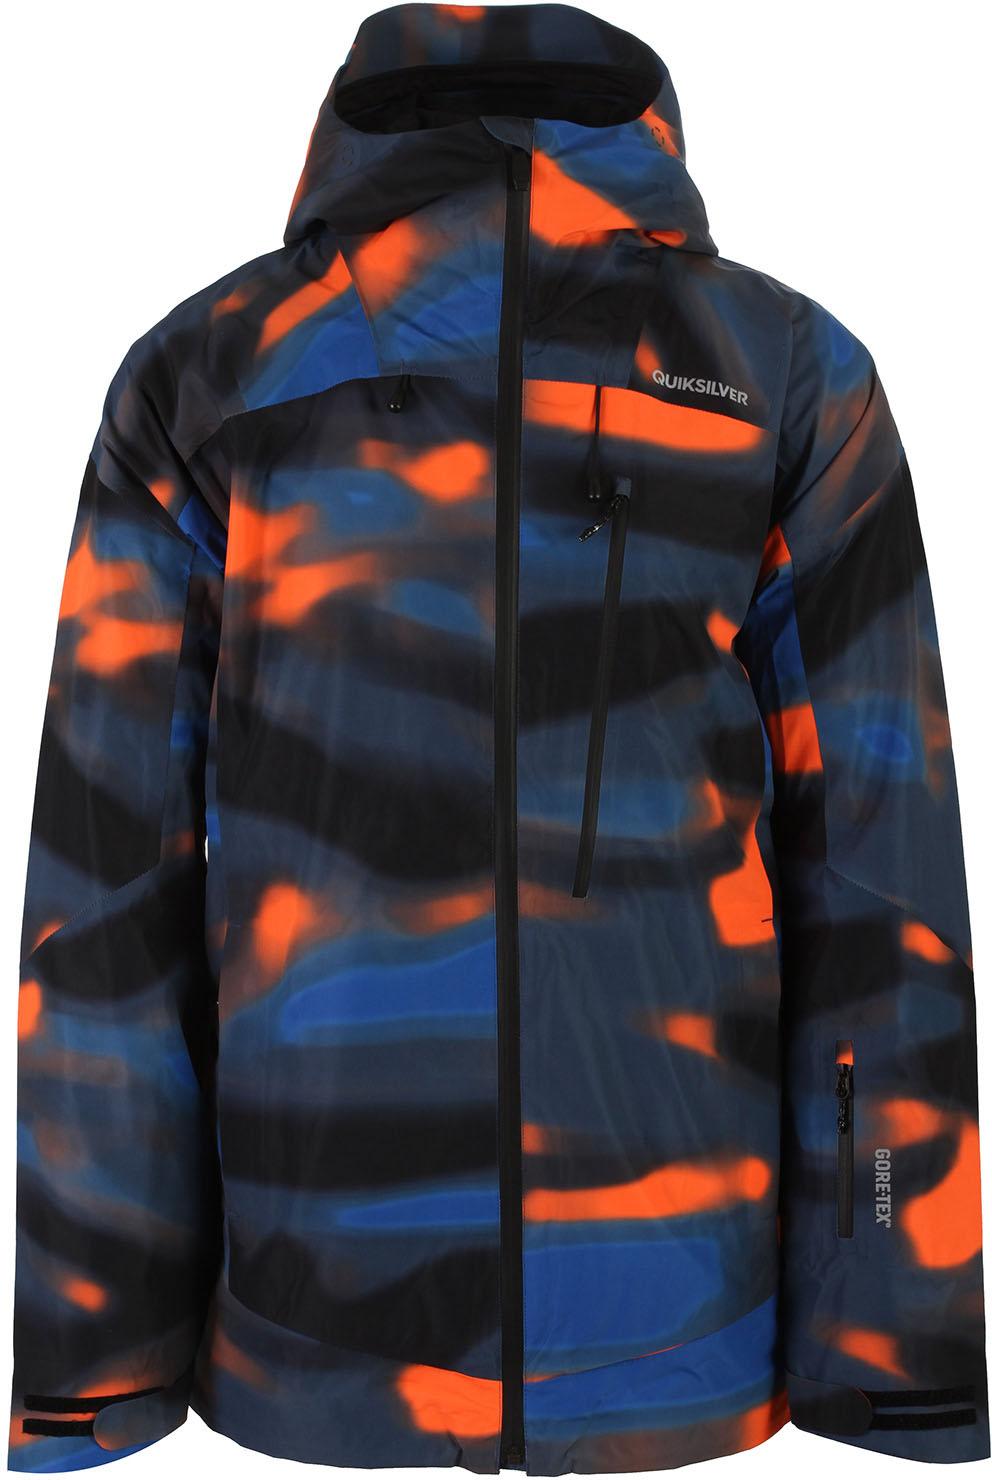 image quicksilver-inyo-jacket-jpg